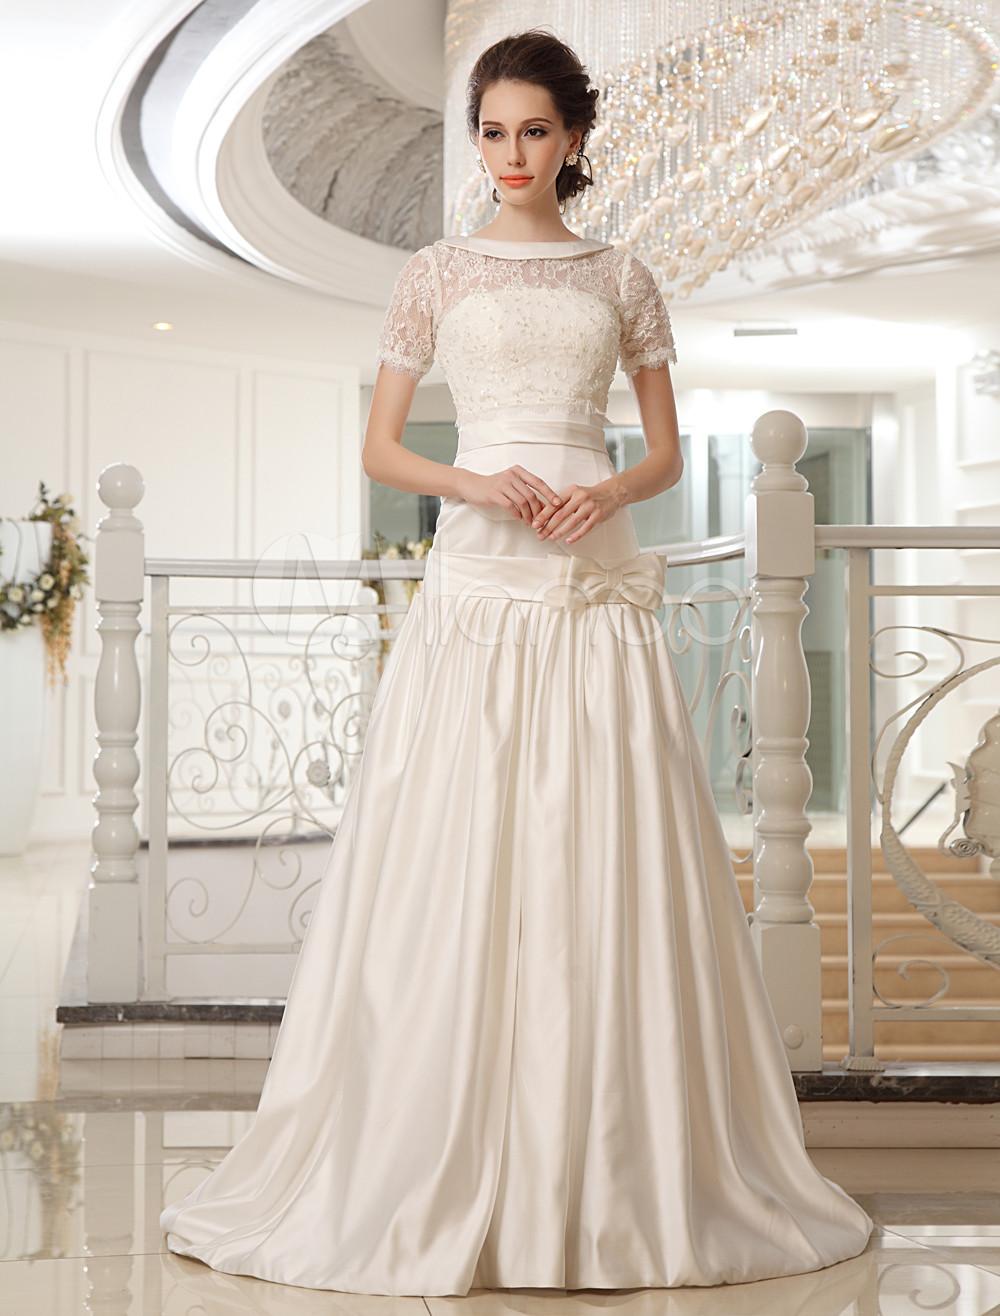 bridal hair accessories melbourne cbd: veils accessories l a